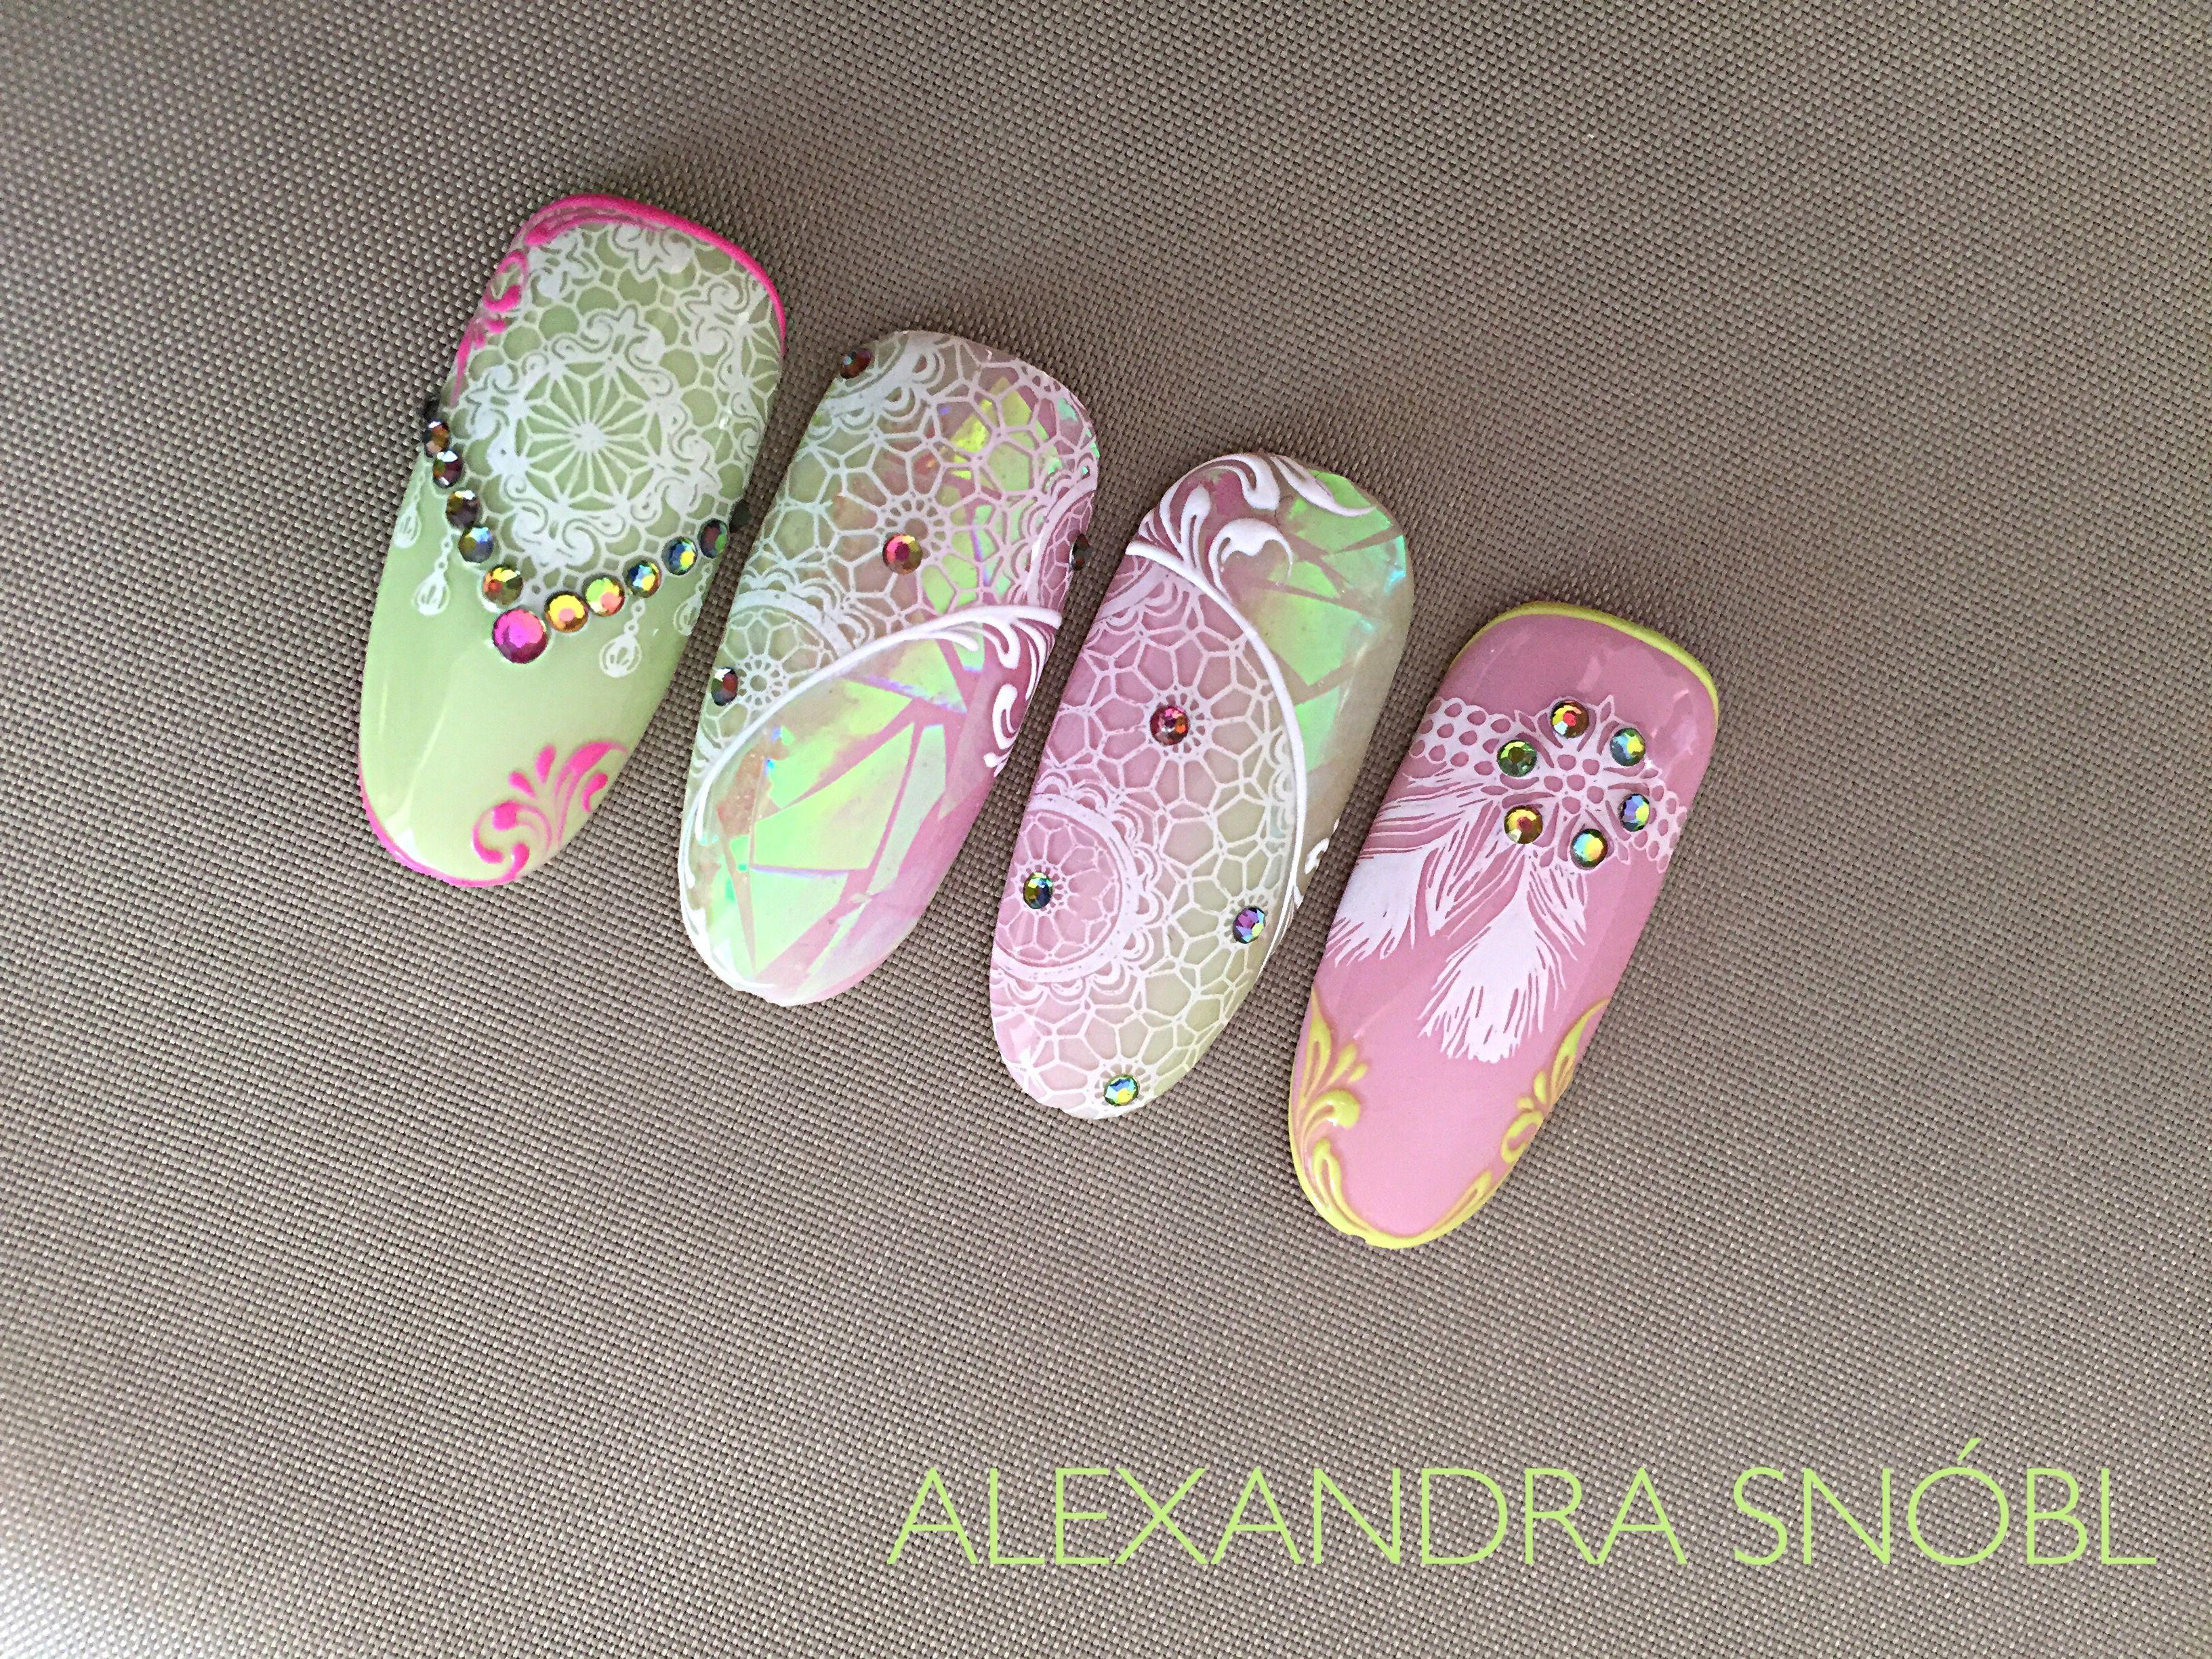 Pin by Roxana Variu on unghi | Pinterest | Nail stamping, School ...